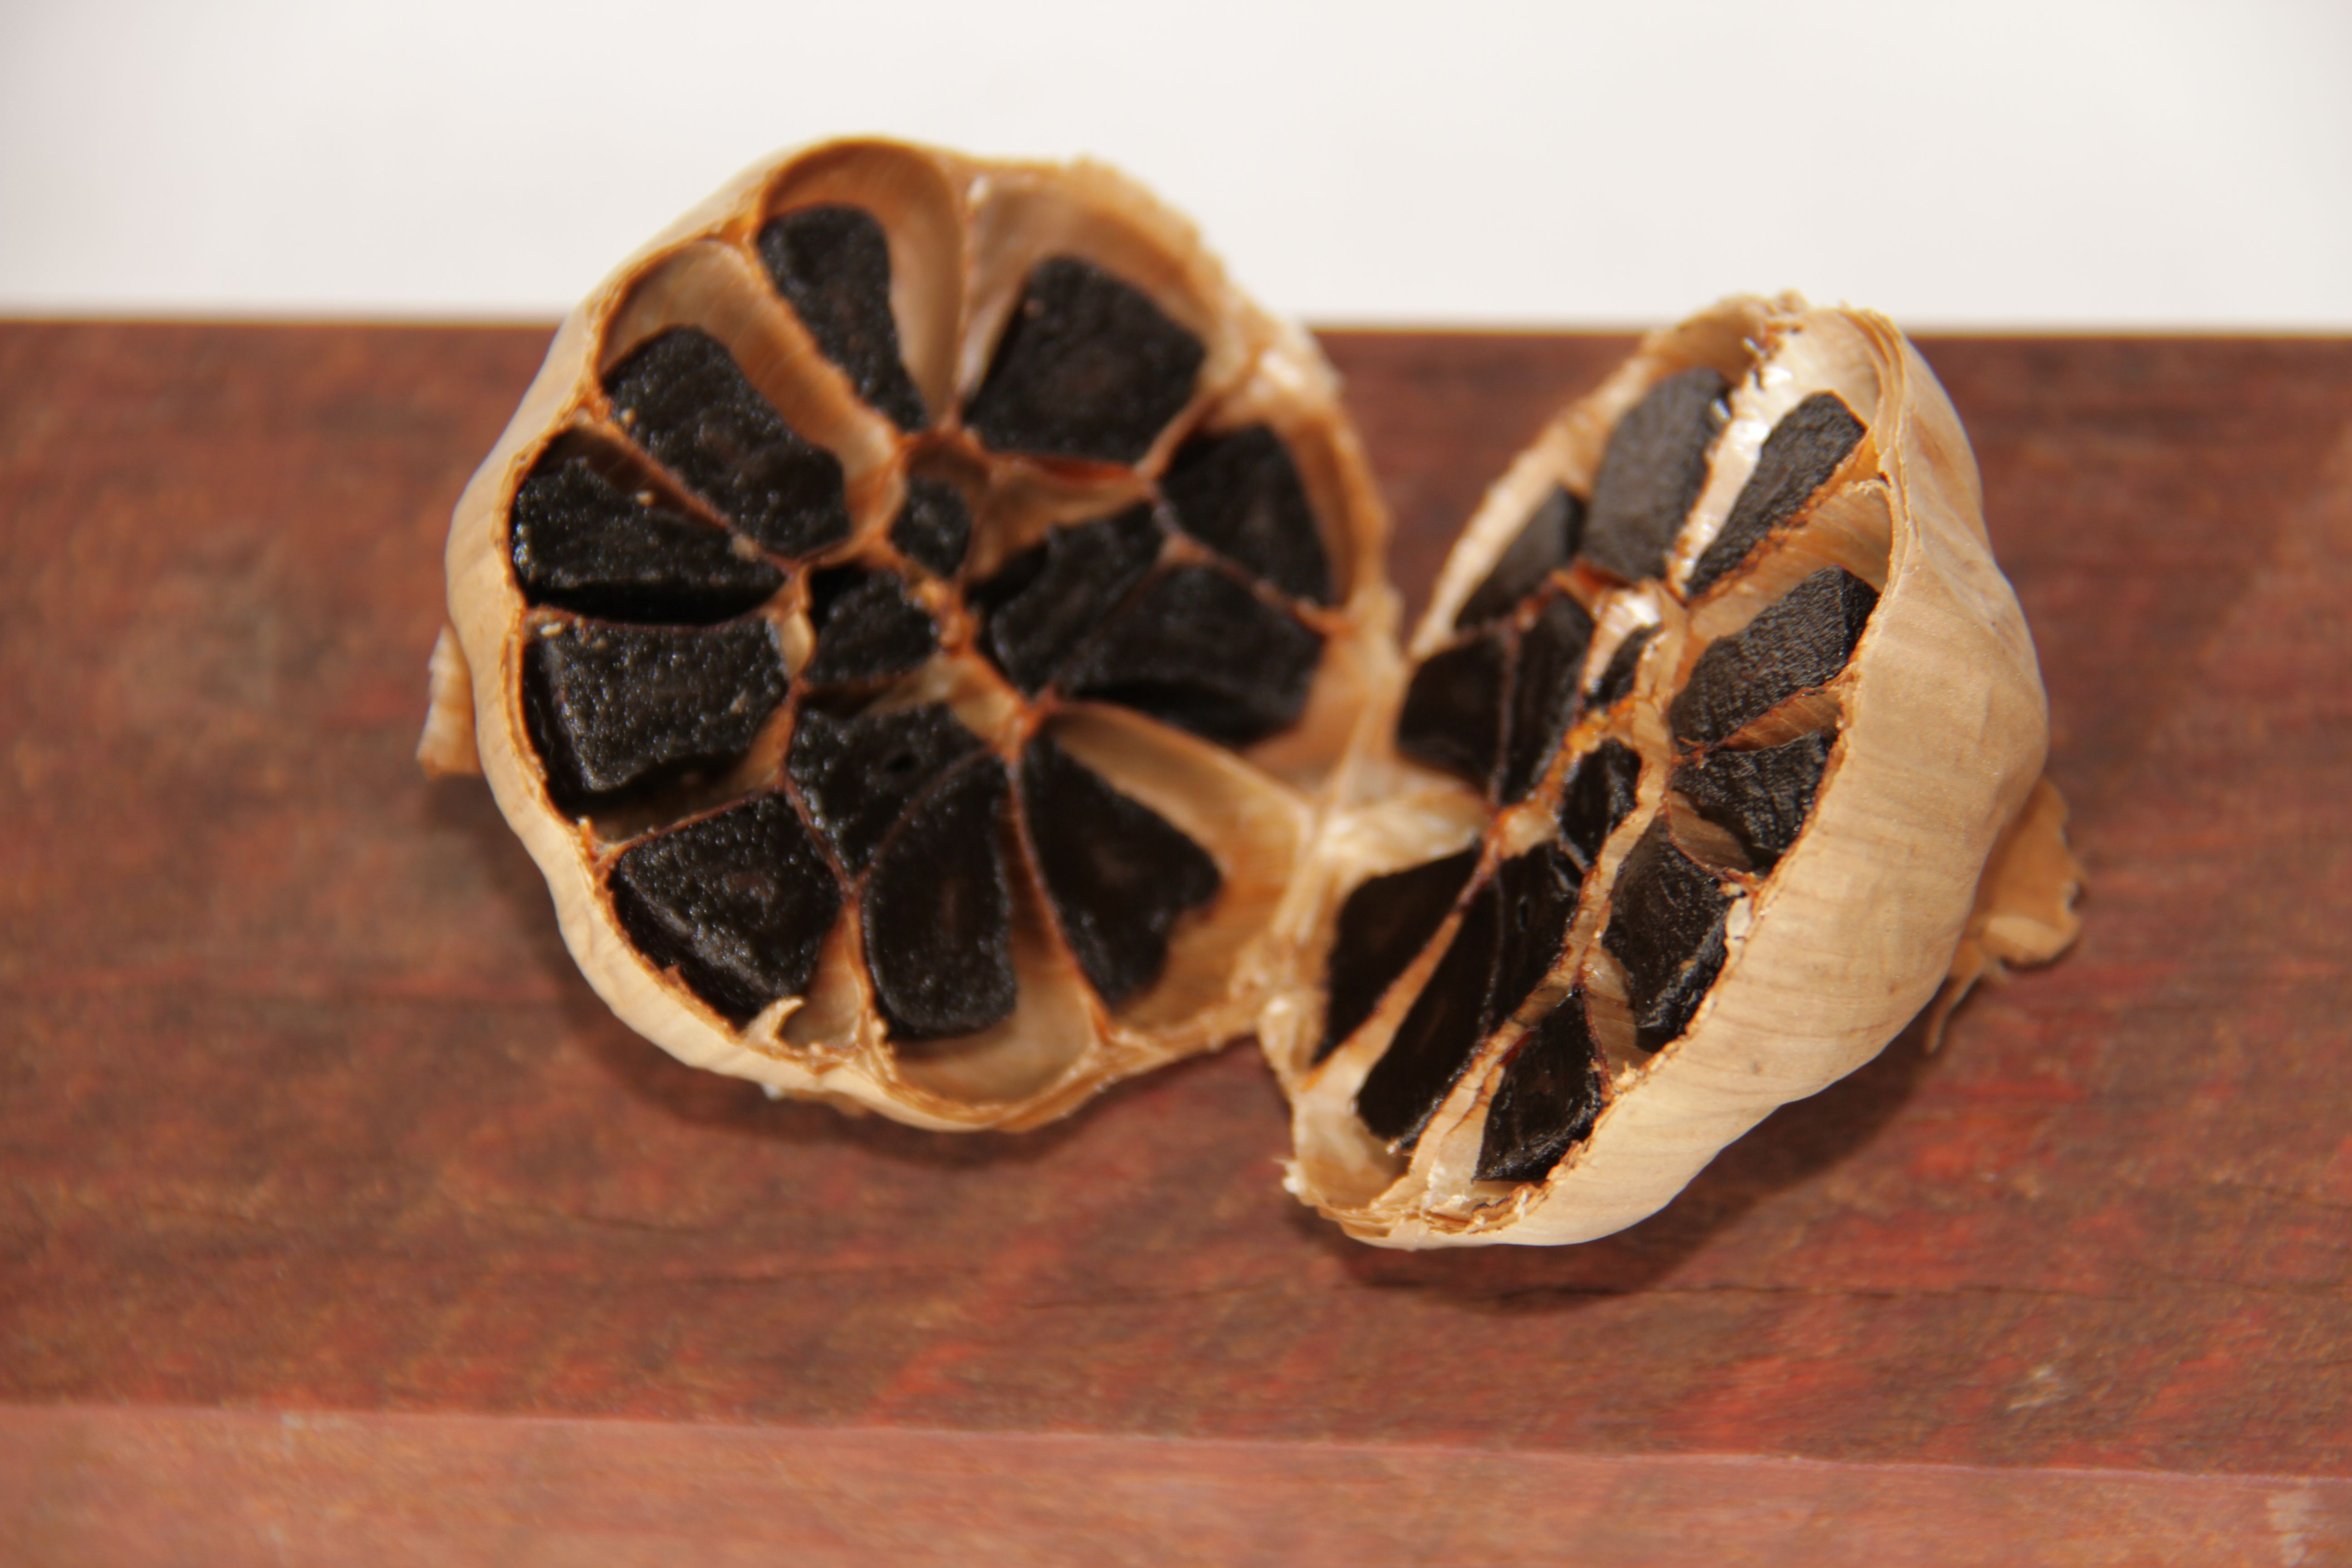 Glorious black garlic from Garlicious Grown